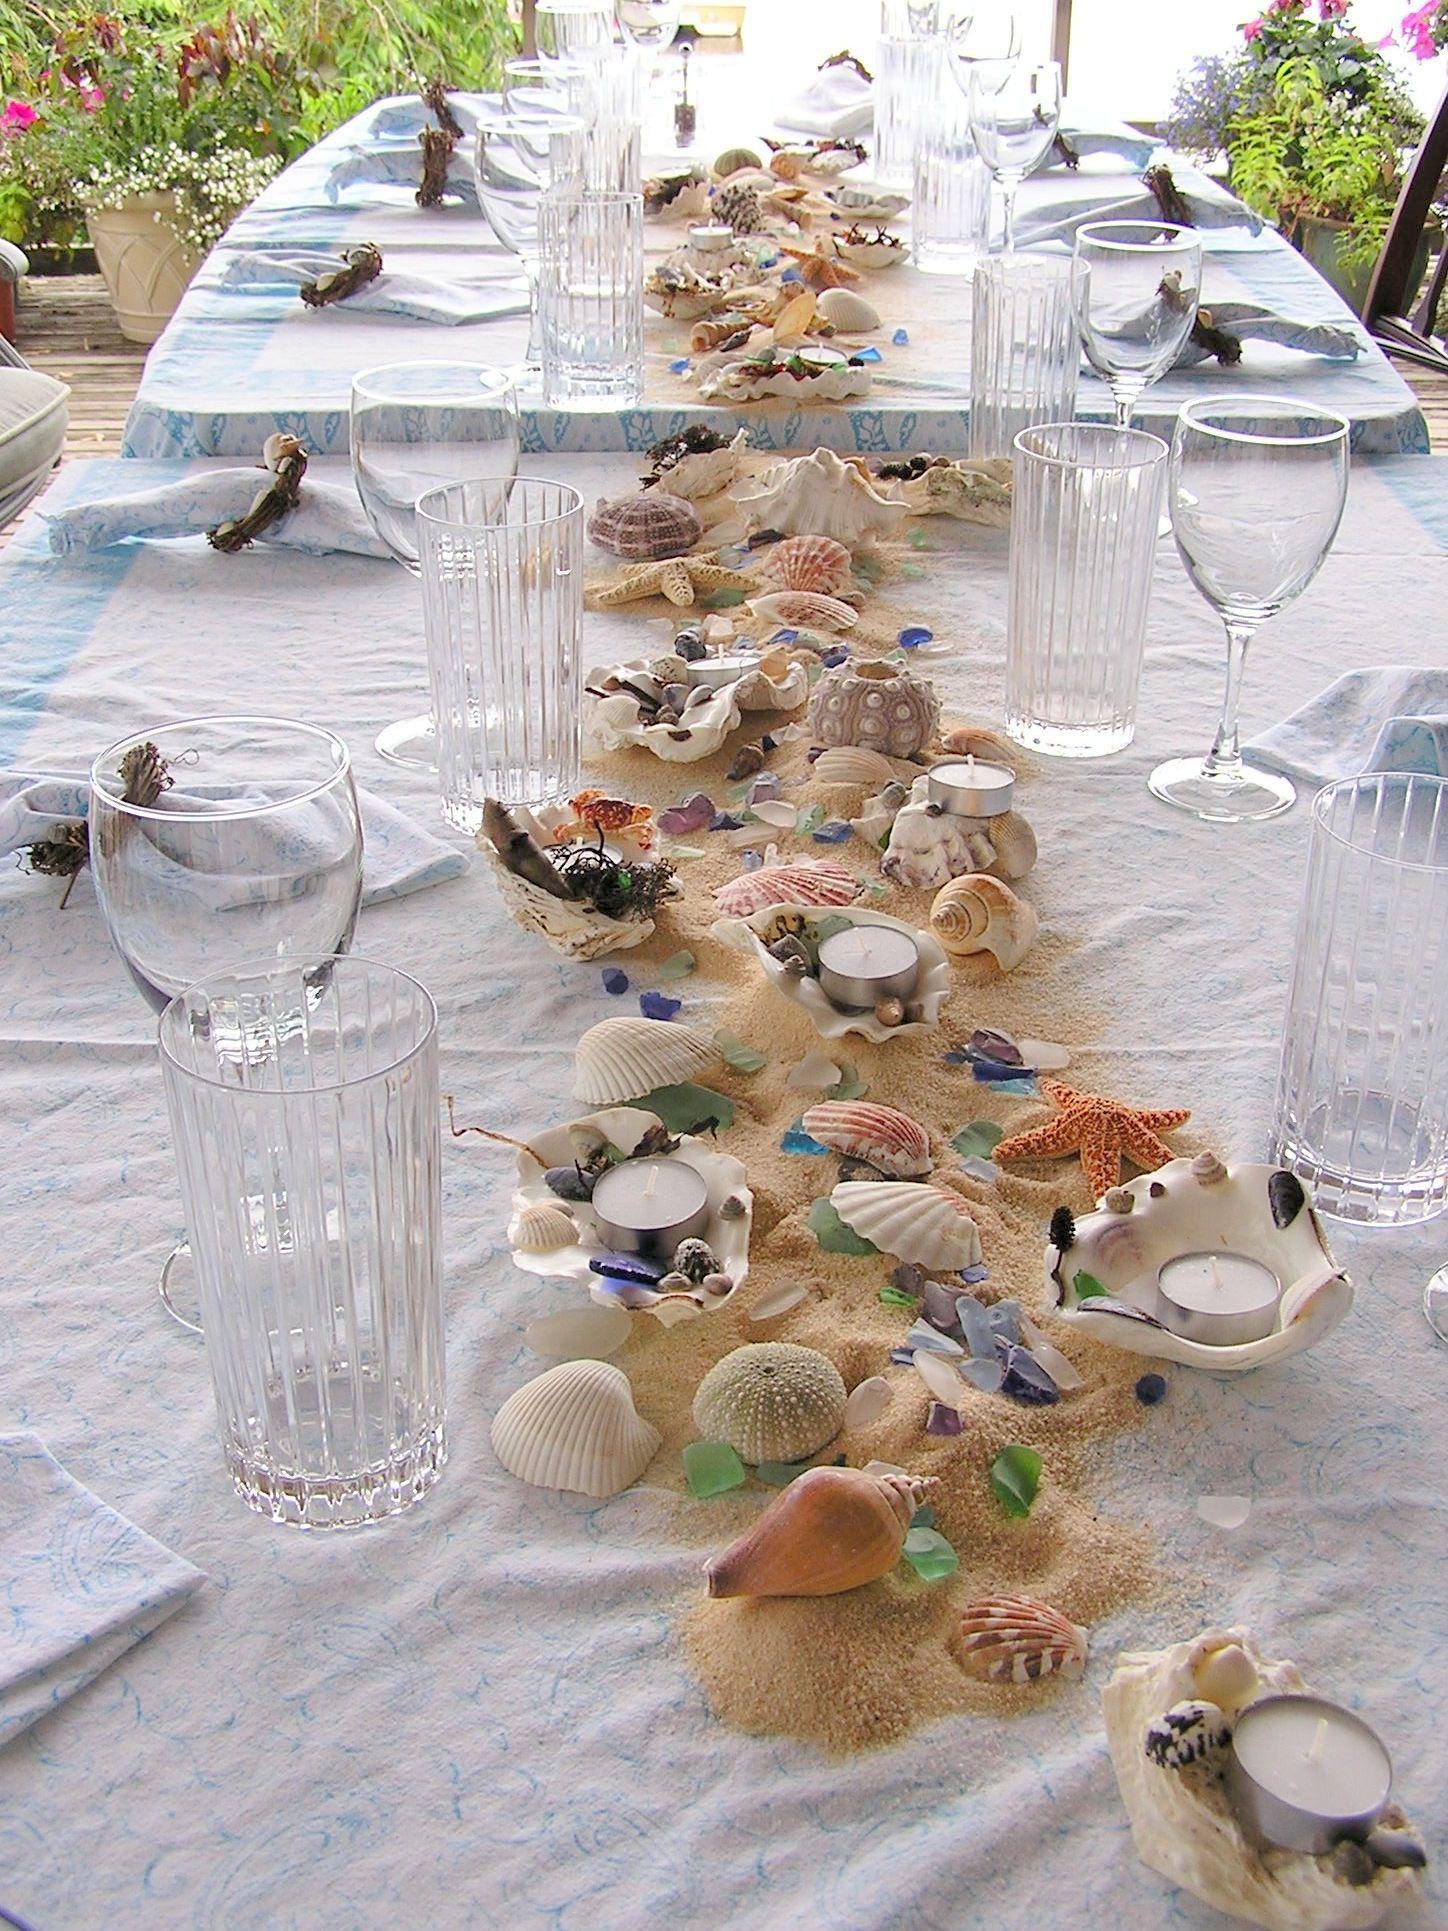 Good Beach Combing Tablescape L Beach Party Ideas L Www.CarolinaDesigns.com